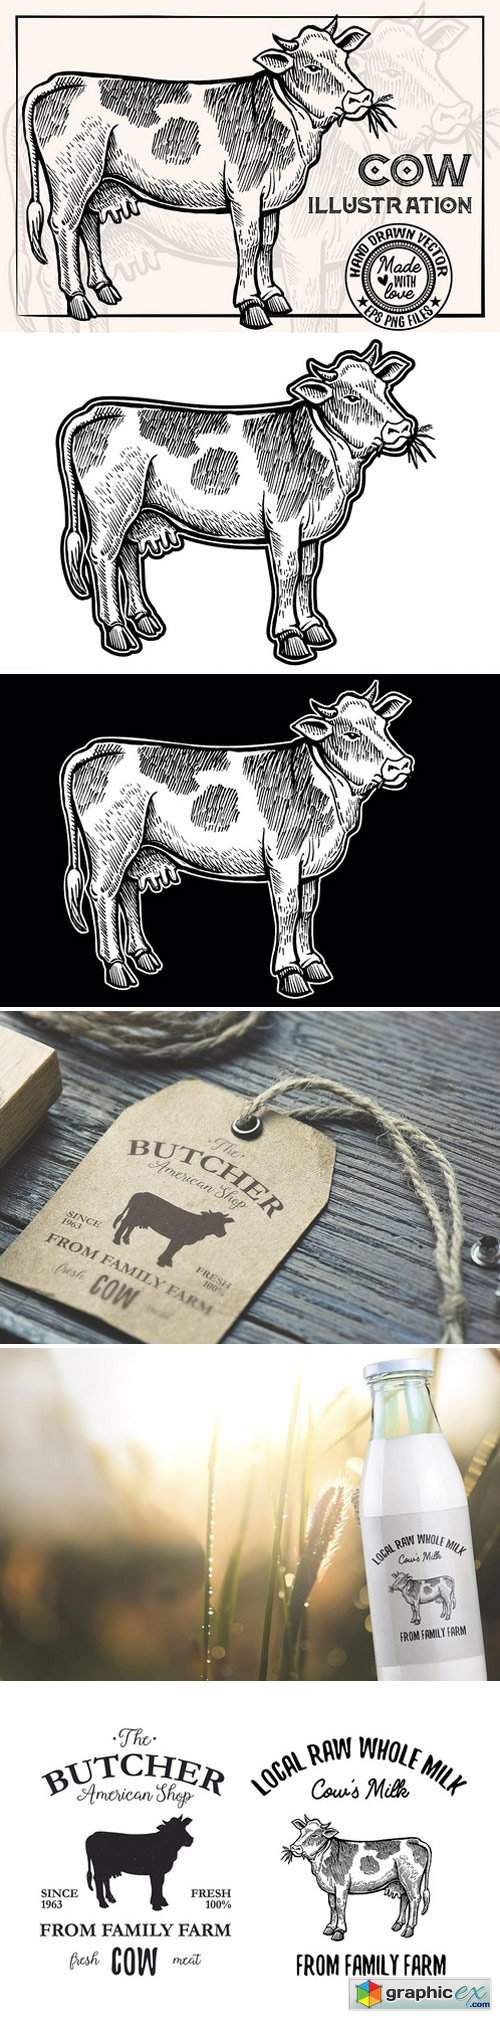 Cow Vintage Illustration 1910176